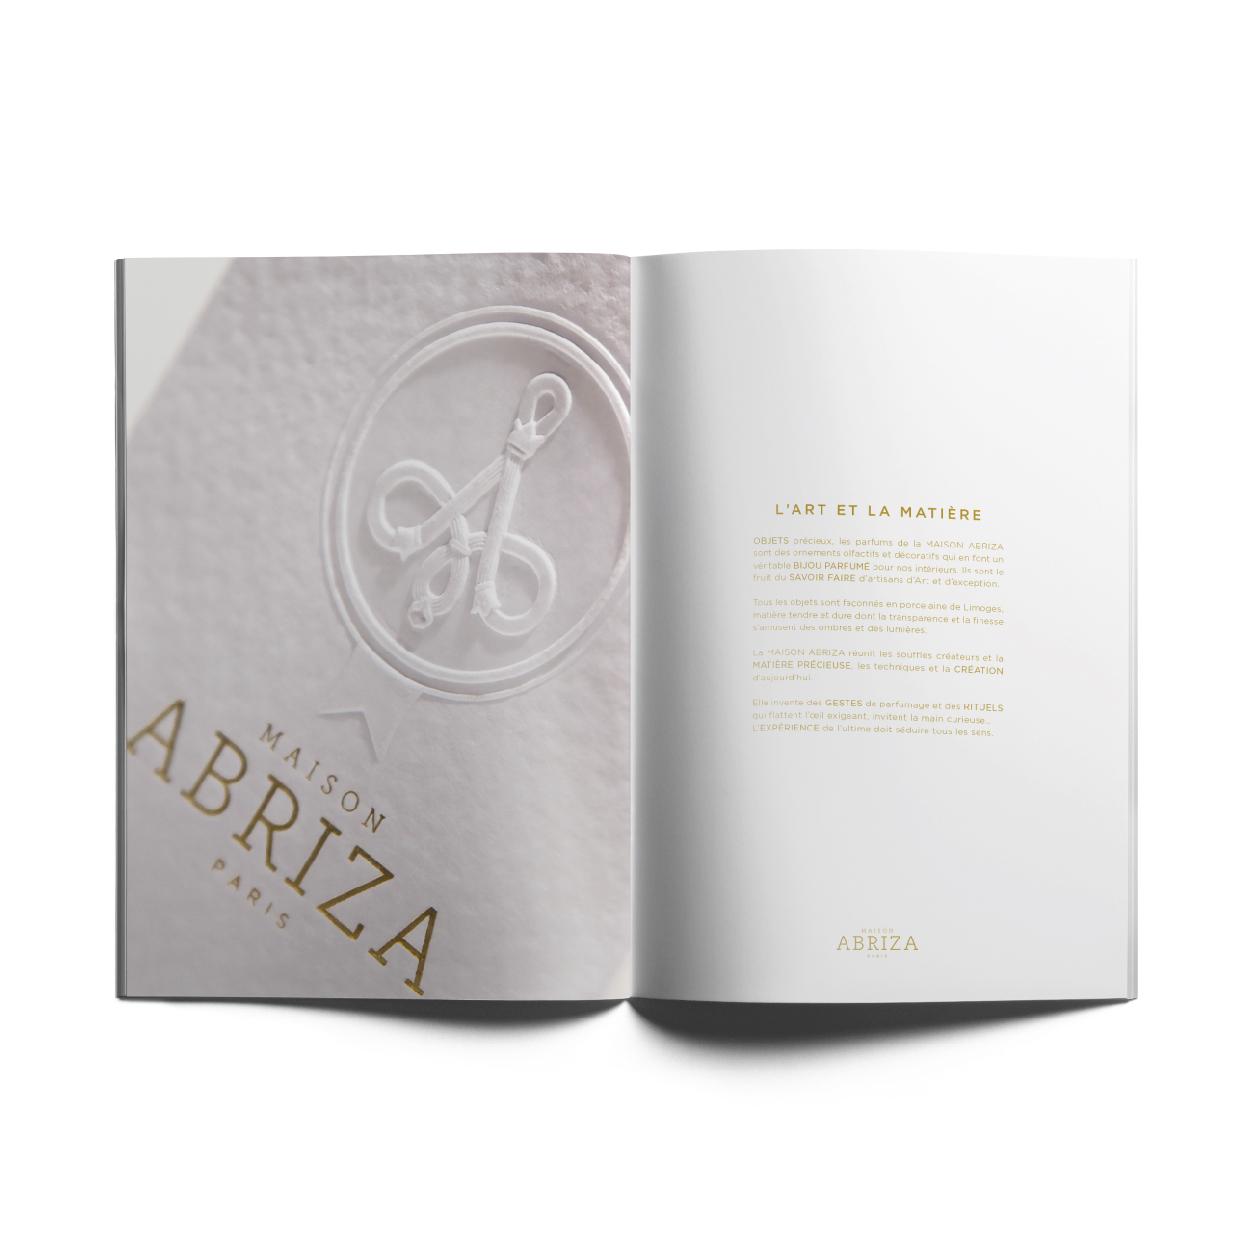 1703-FACTORY-ABRIZA-PRINT-02